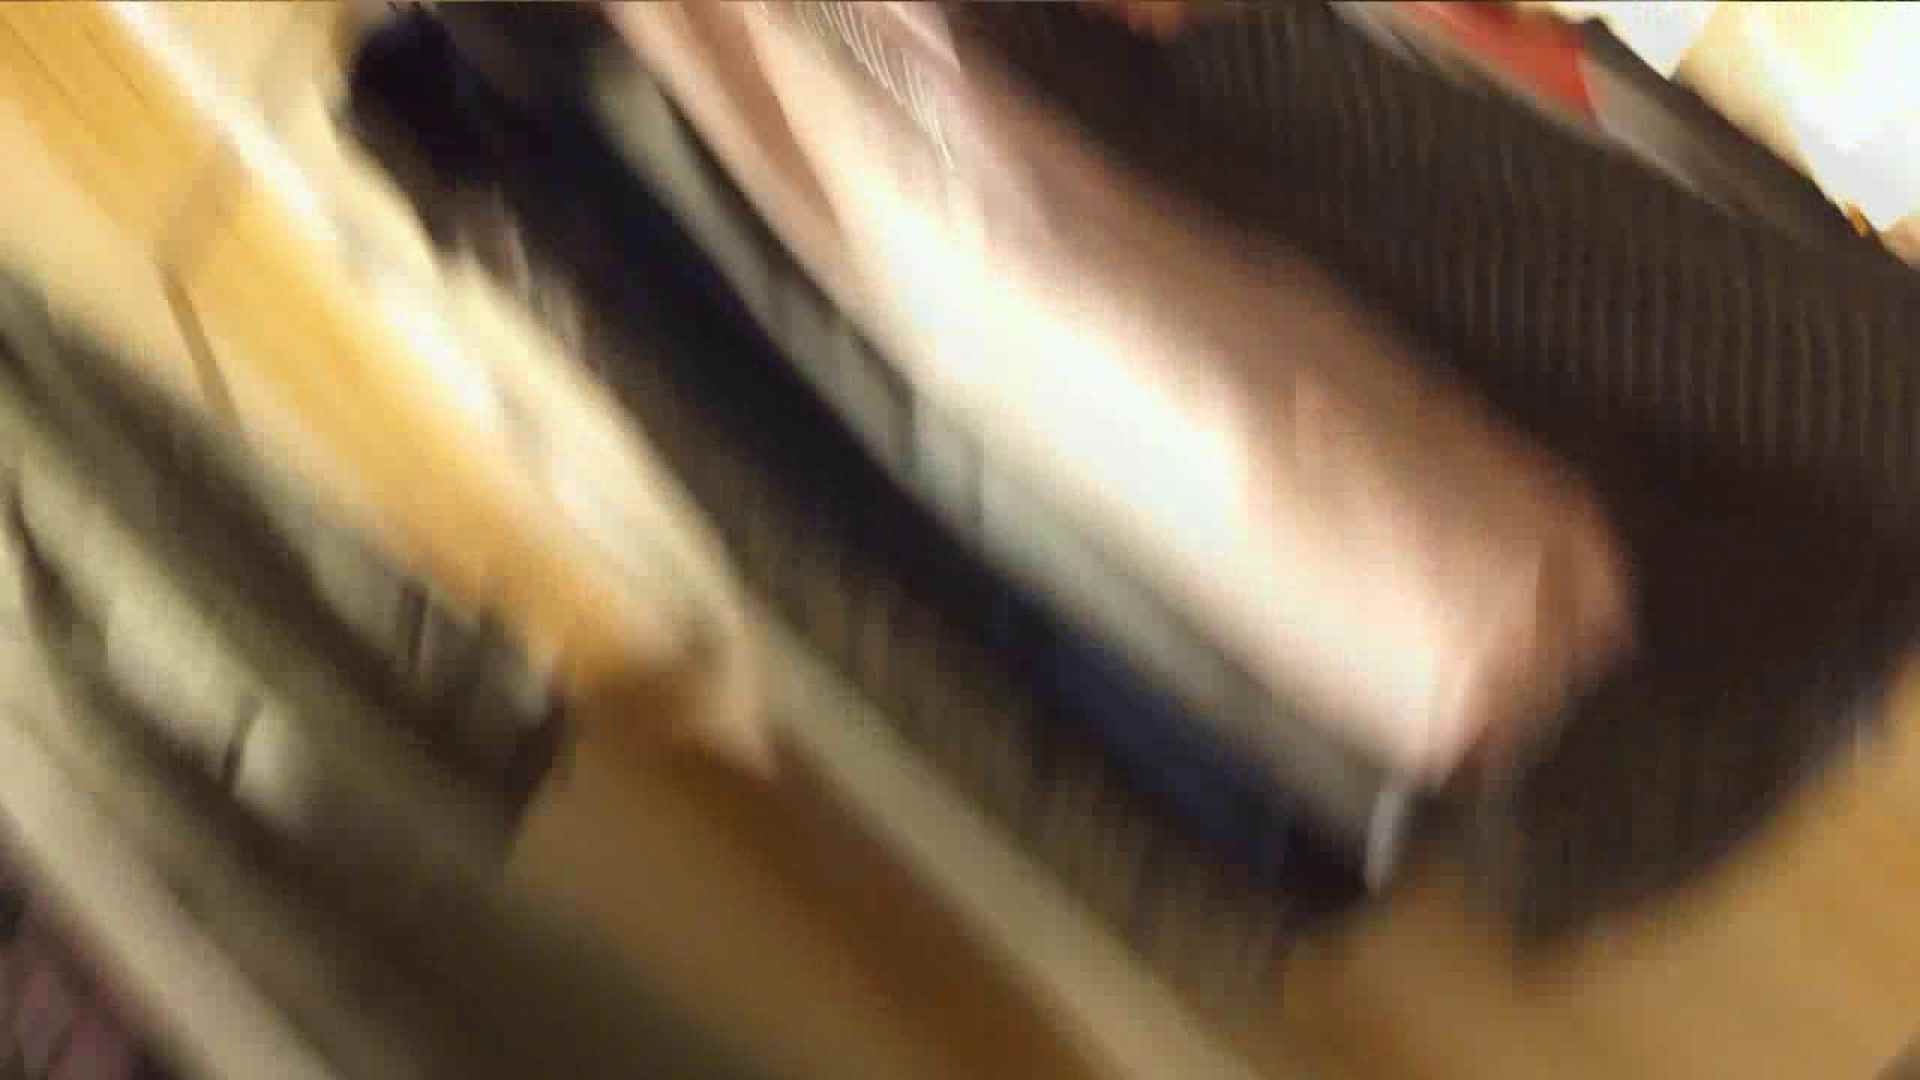 vol.40 美人アパレル胸チラ&パンチラ もっこりパンチラ! チラ 覗きワレメ動画紹介 109PICs 80